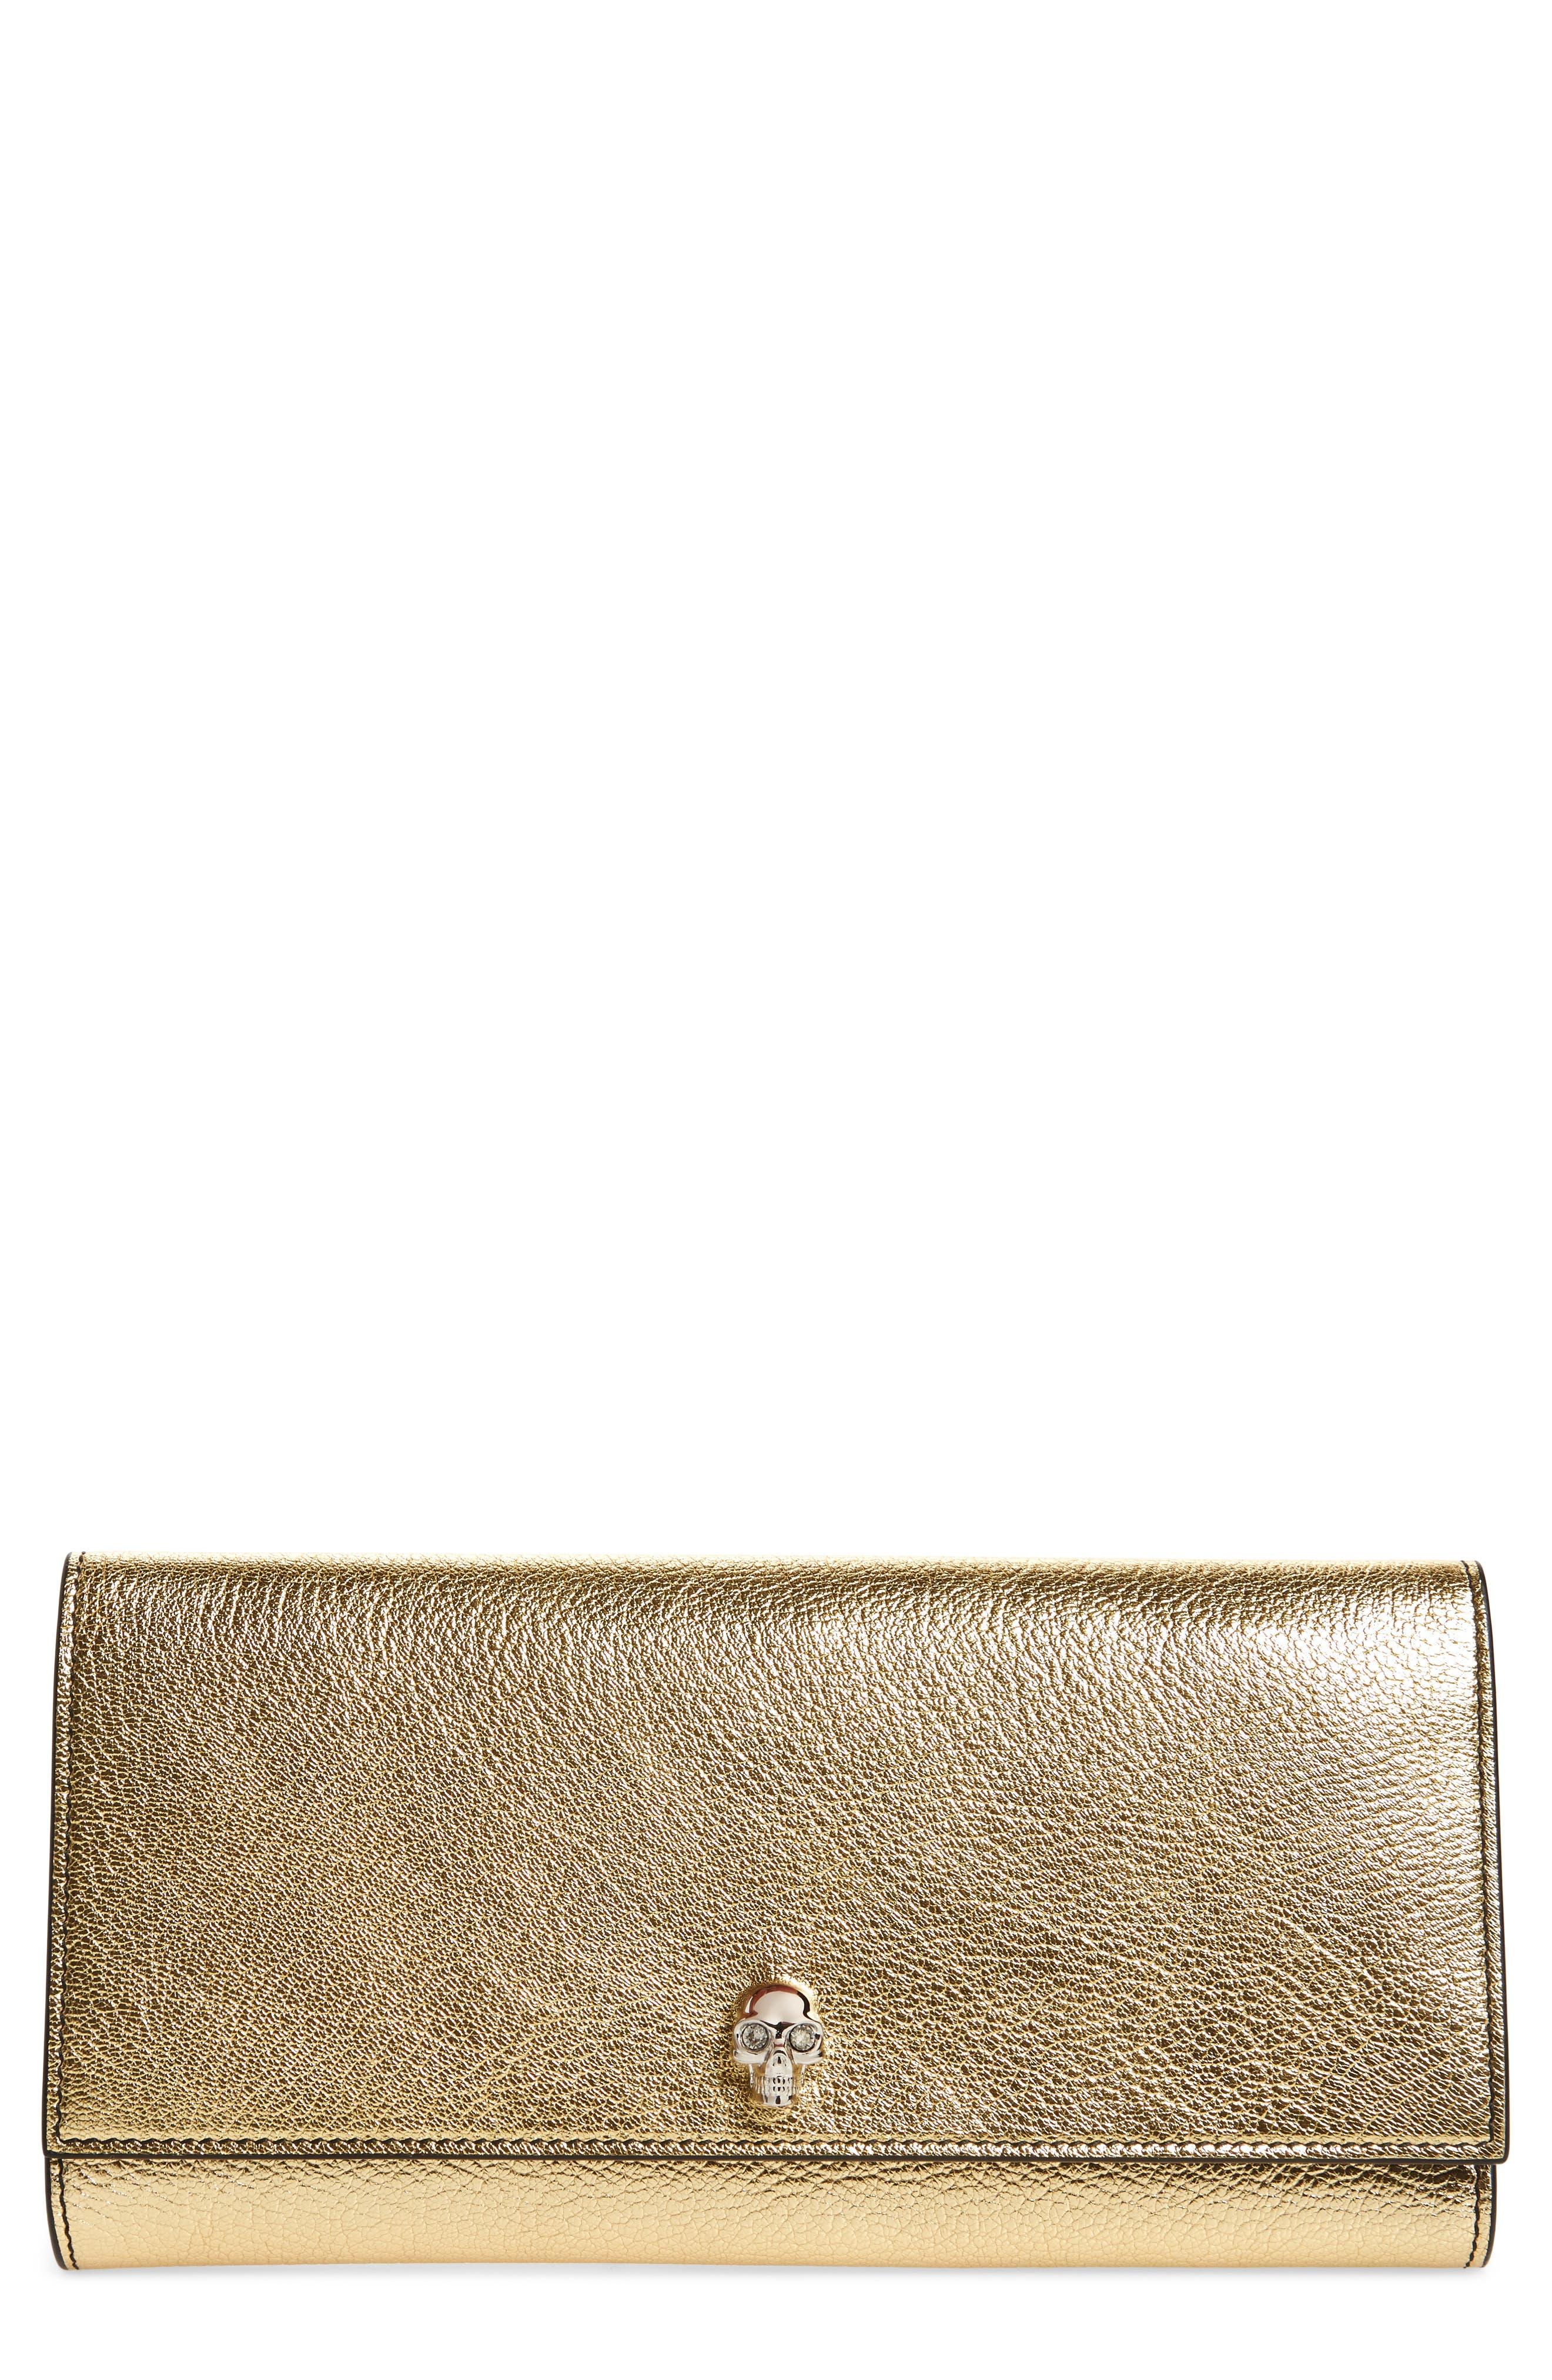 Leather Travel Wallet,                             Main thumbnail 1, color,                             Sahara Gold